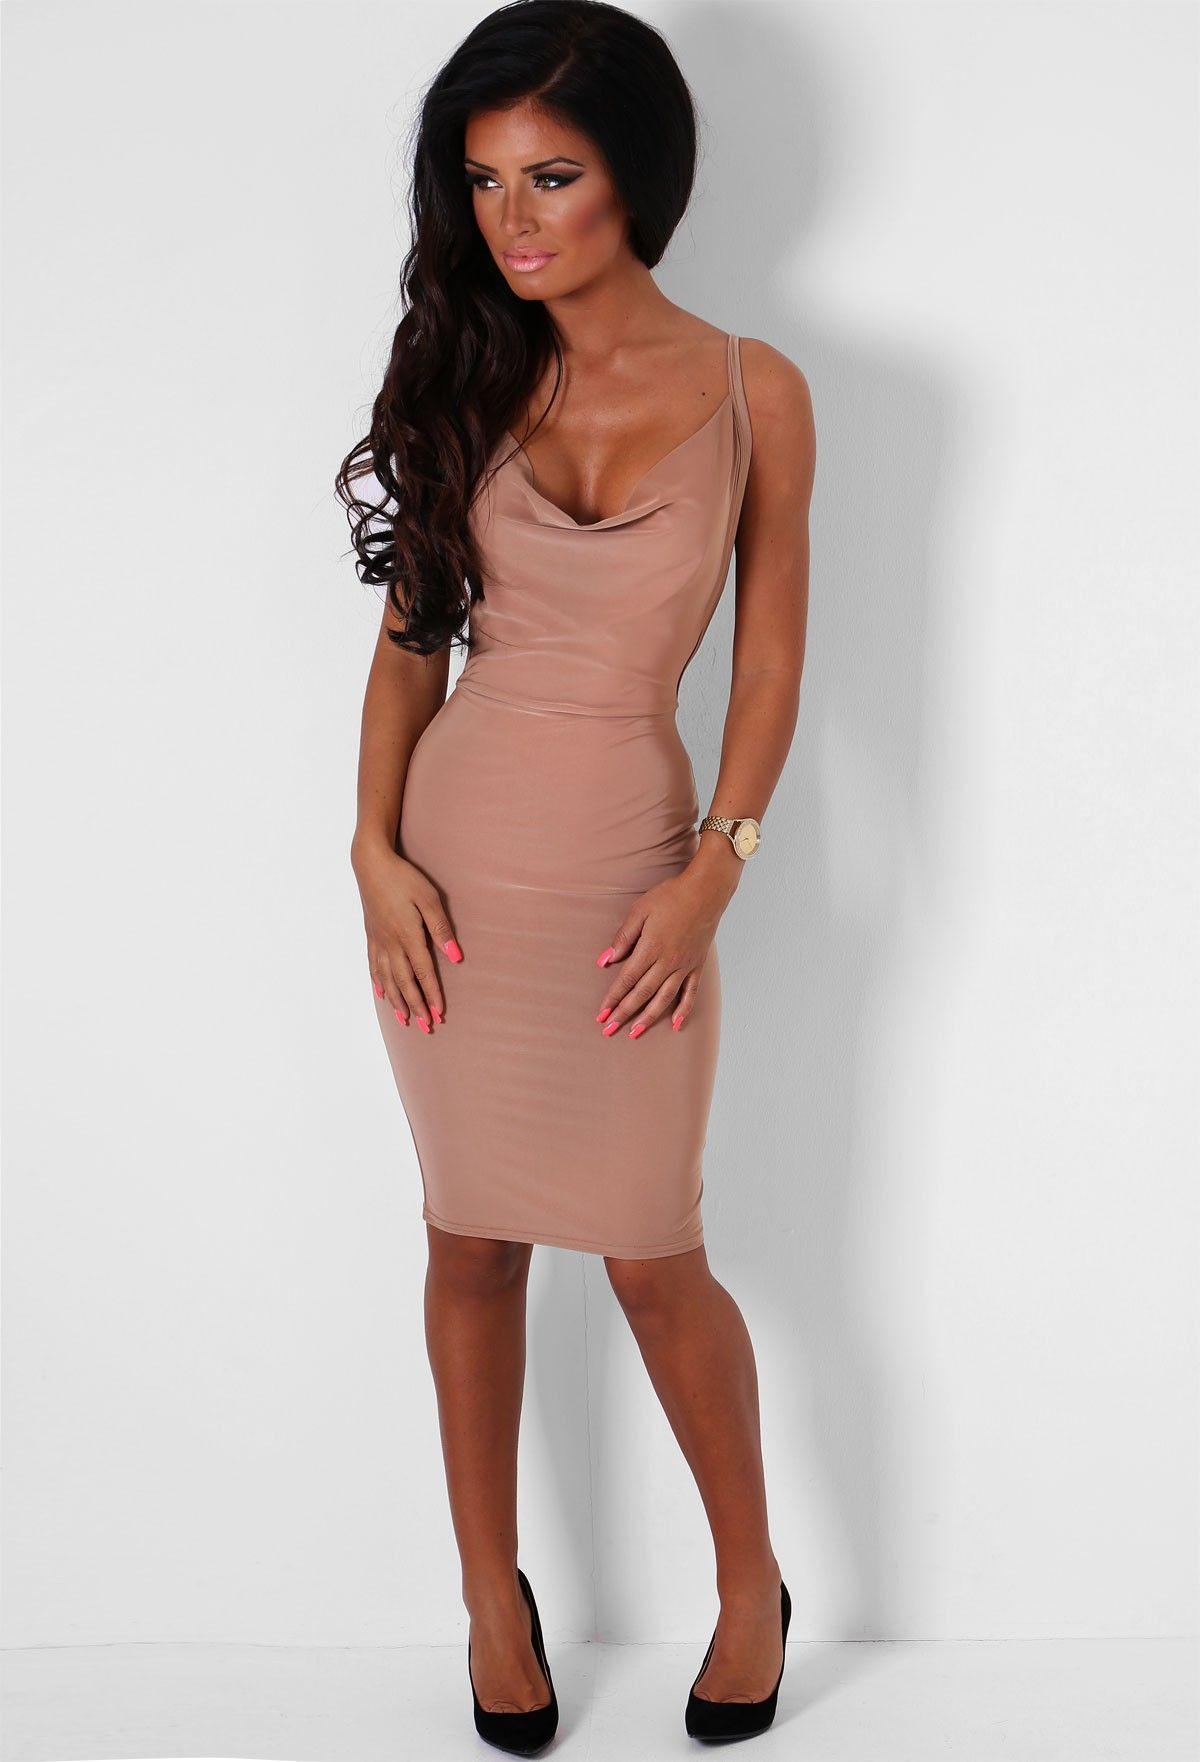 Nadia Mocha Backless Dress   Pink Boutique   Threds   Pinterest ...